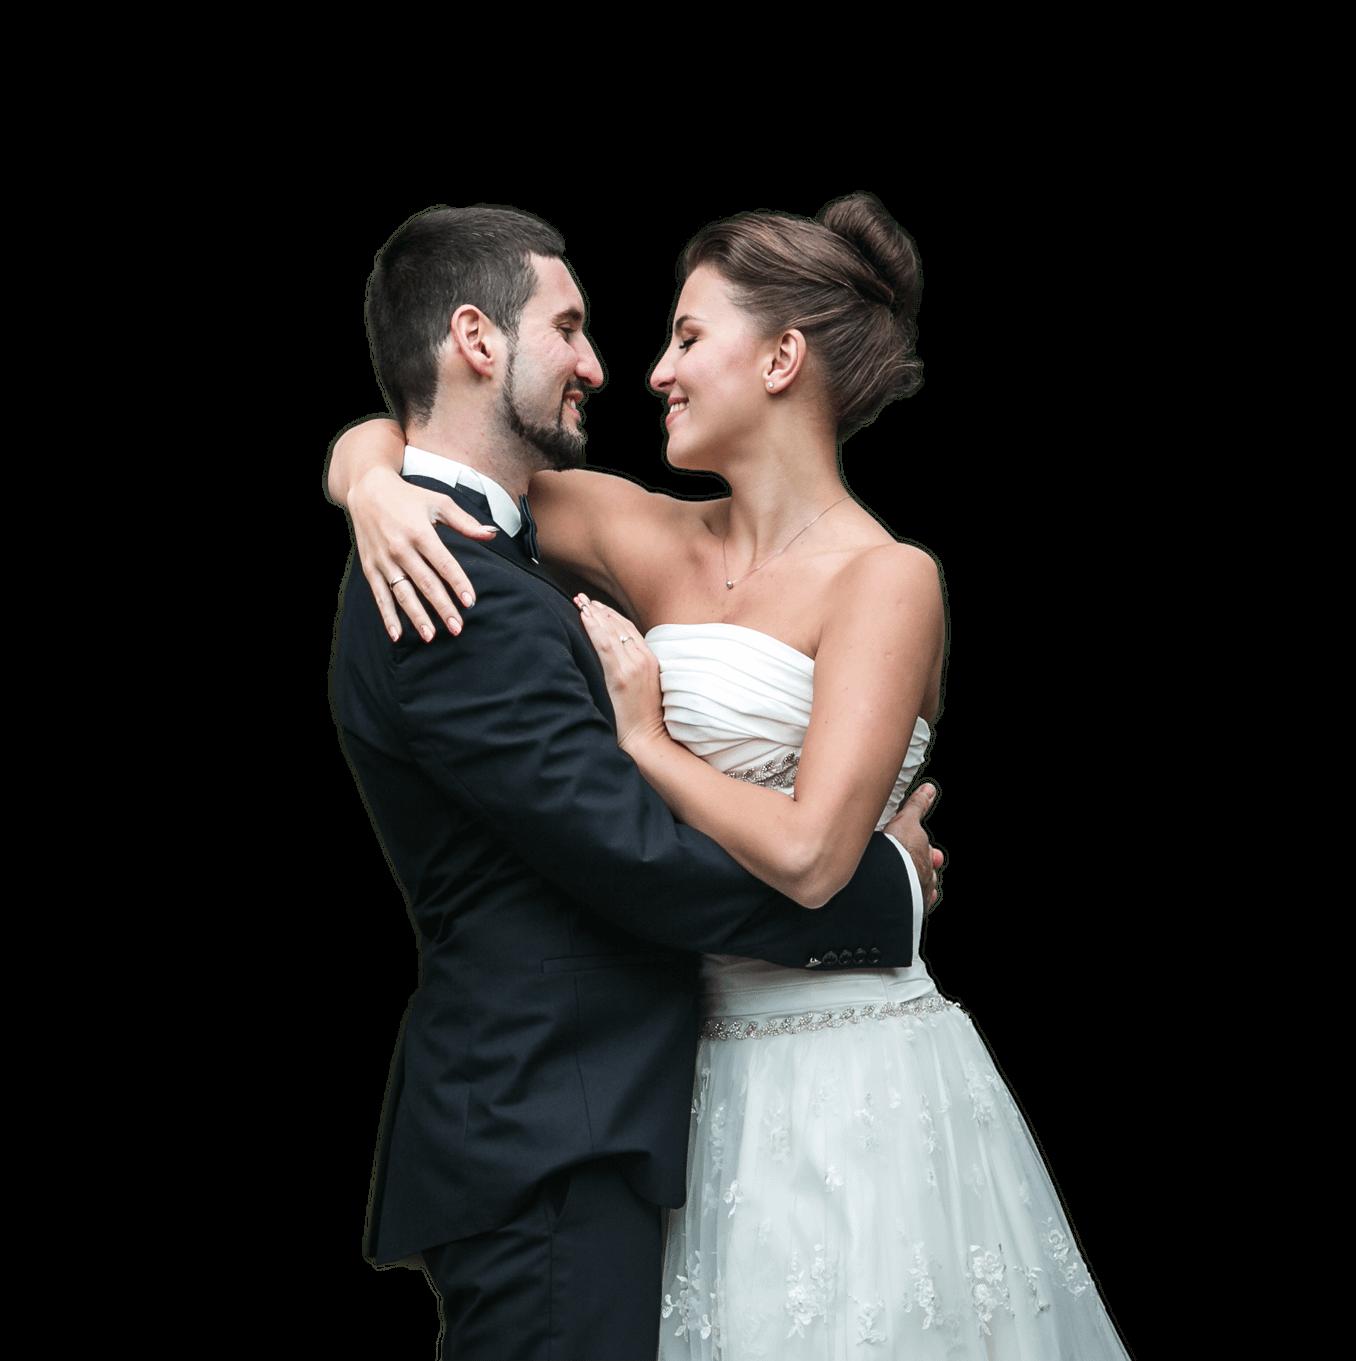 wedding dress tuxedo